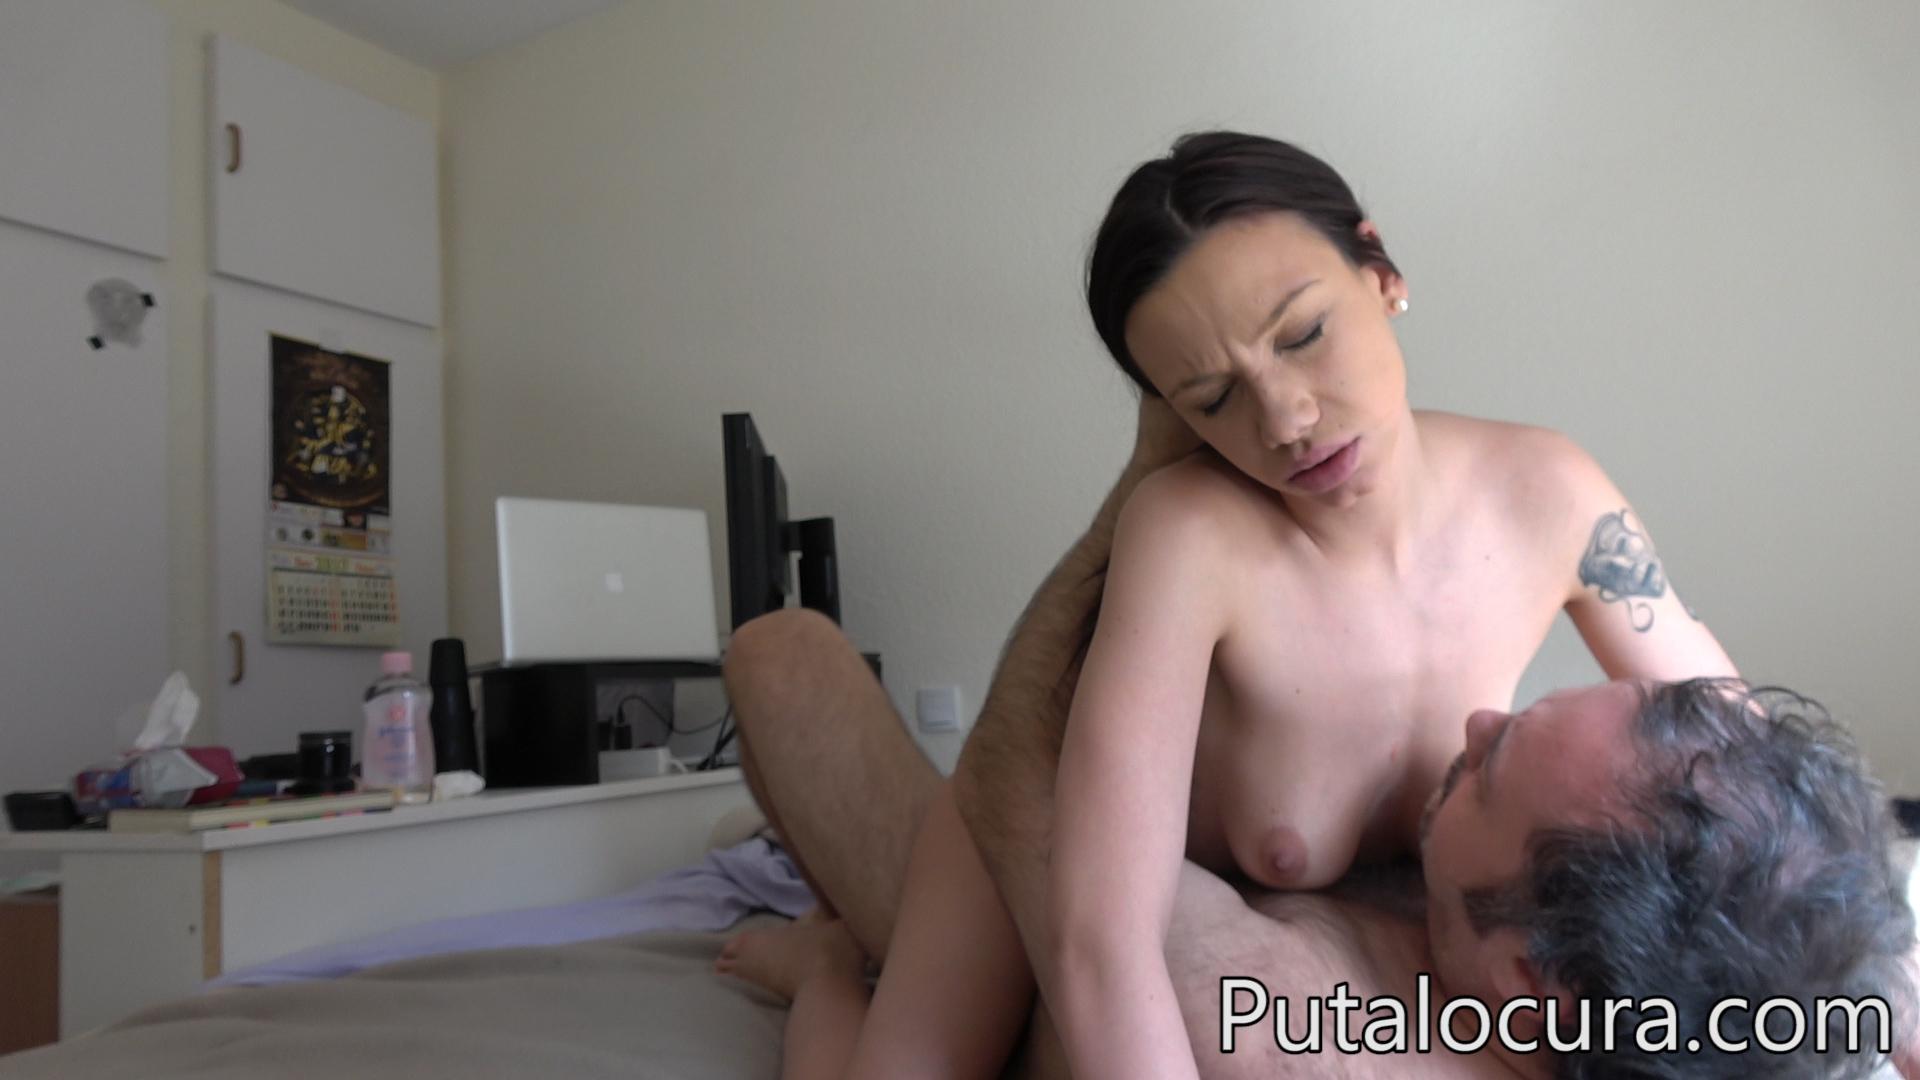 Torbe Pilladas porn videos · Rexxx